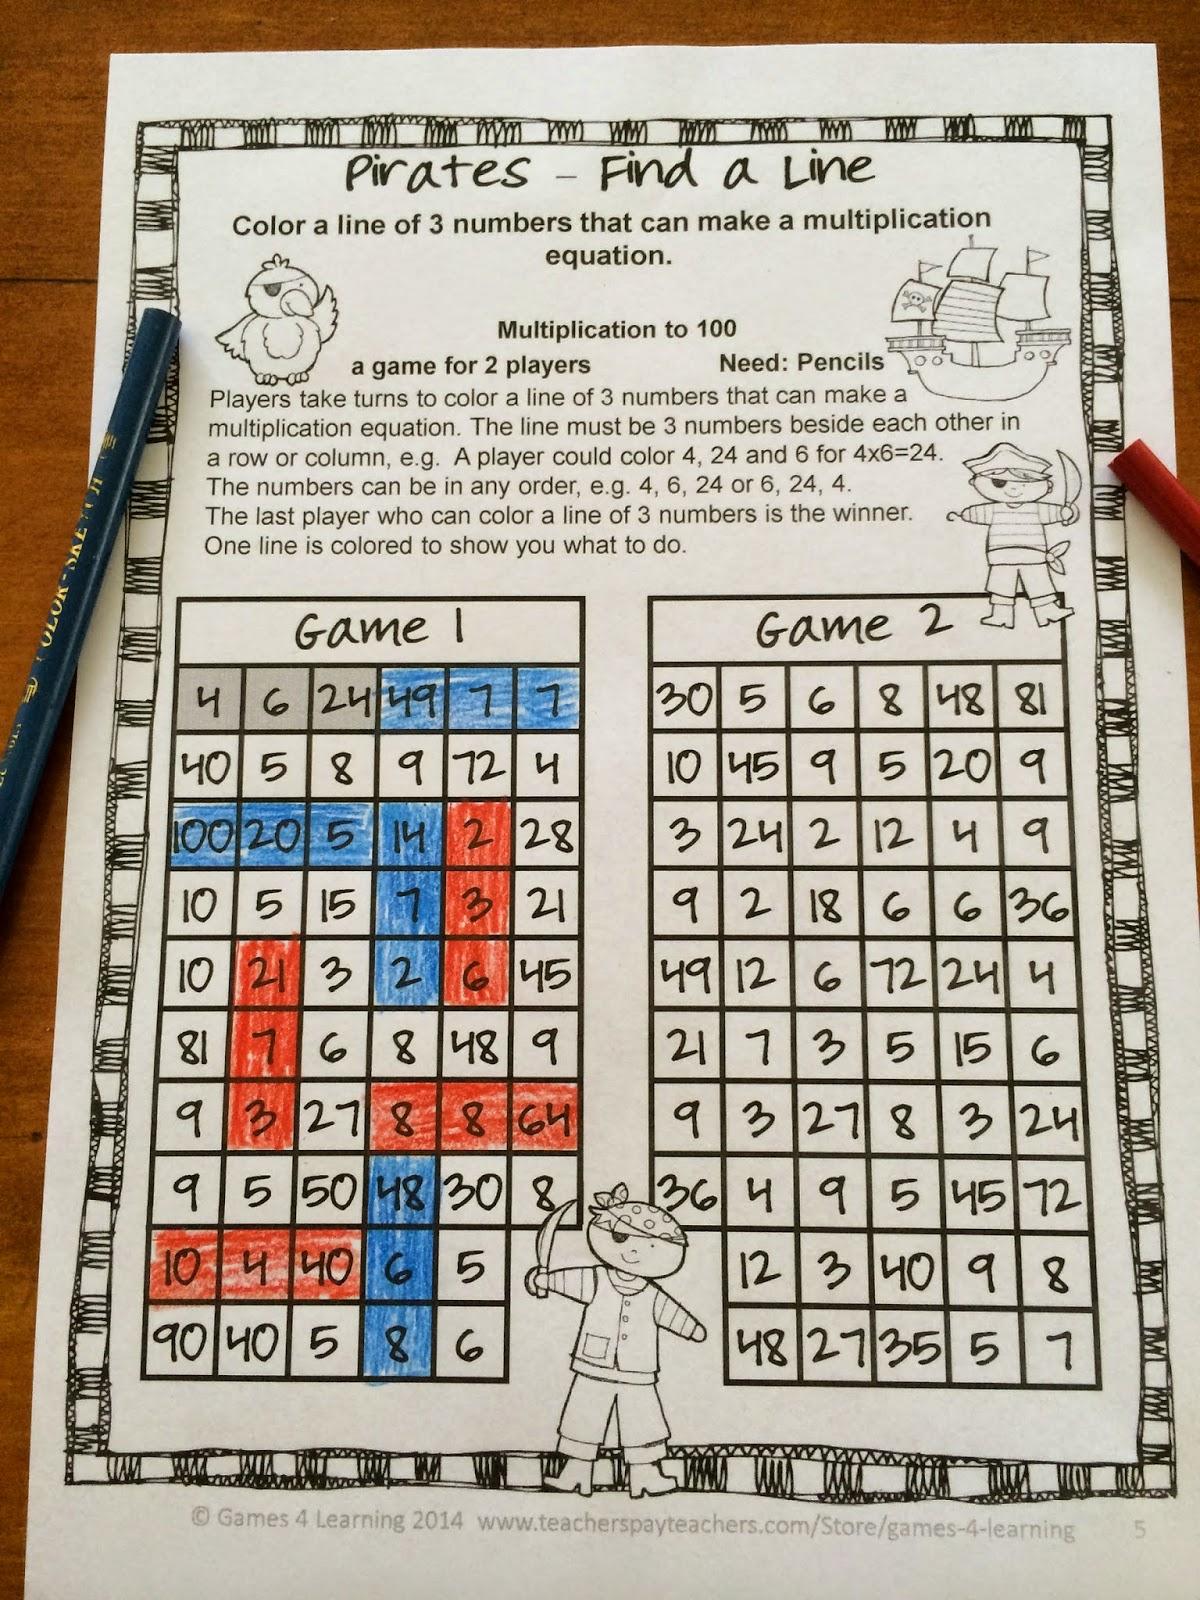 http://www.teacherspayteachers.com/Product/Multiplication-1199527